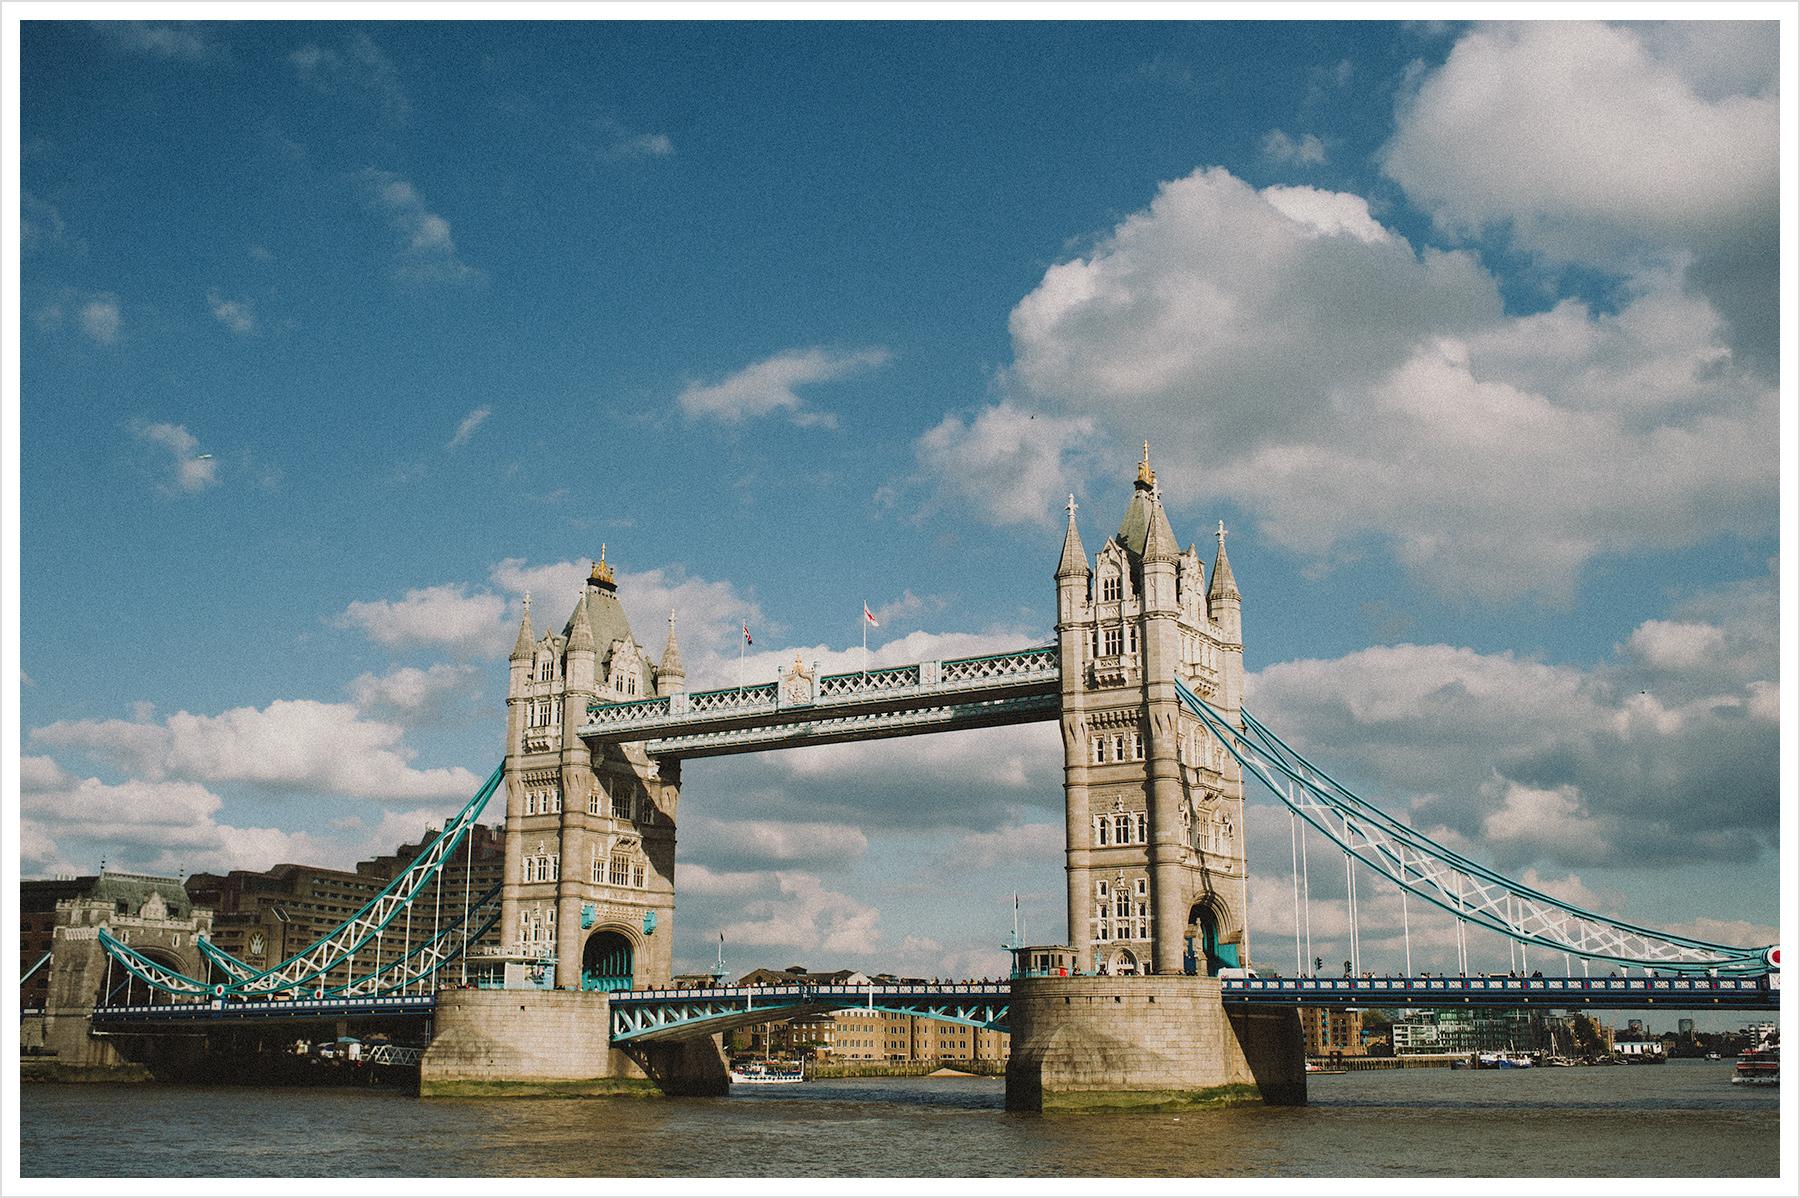 20151020_LONDON-BRIDGE_252_DSC_9978.jpg